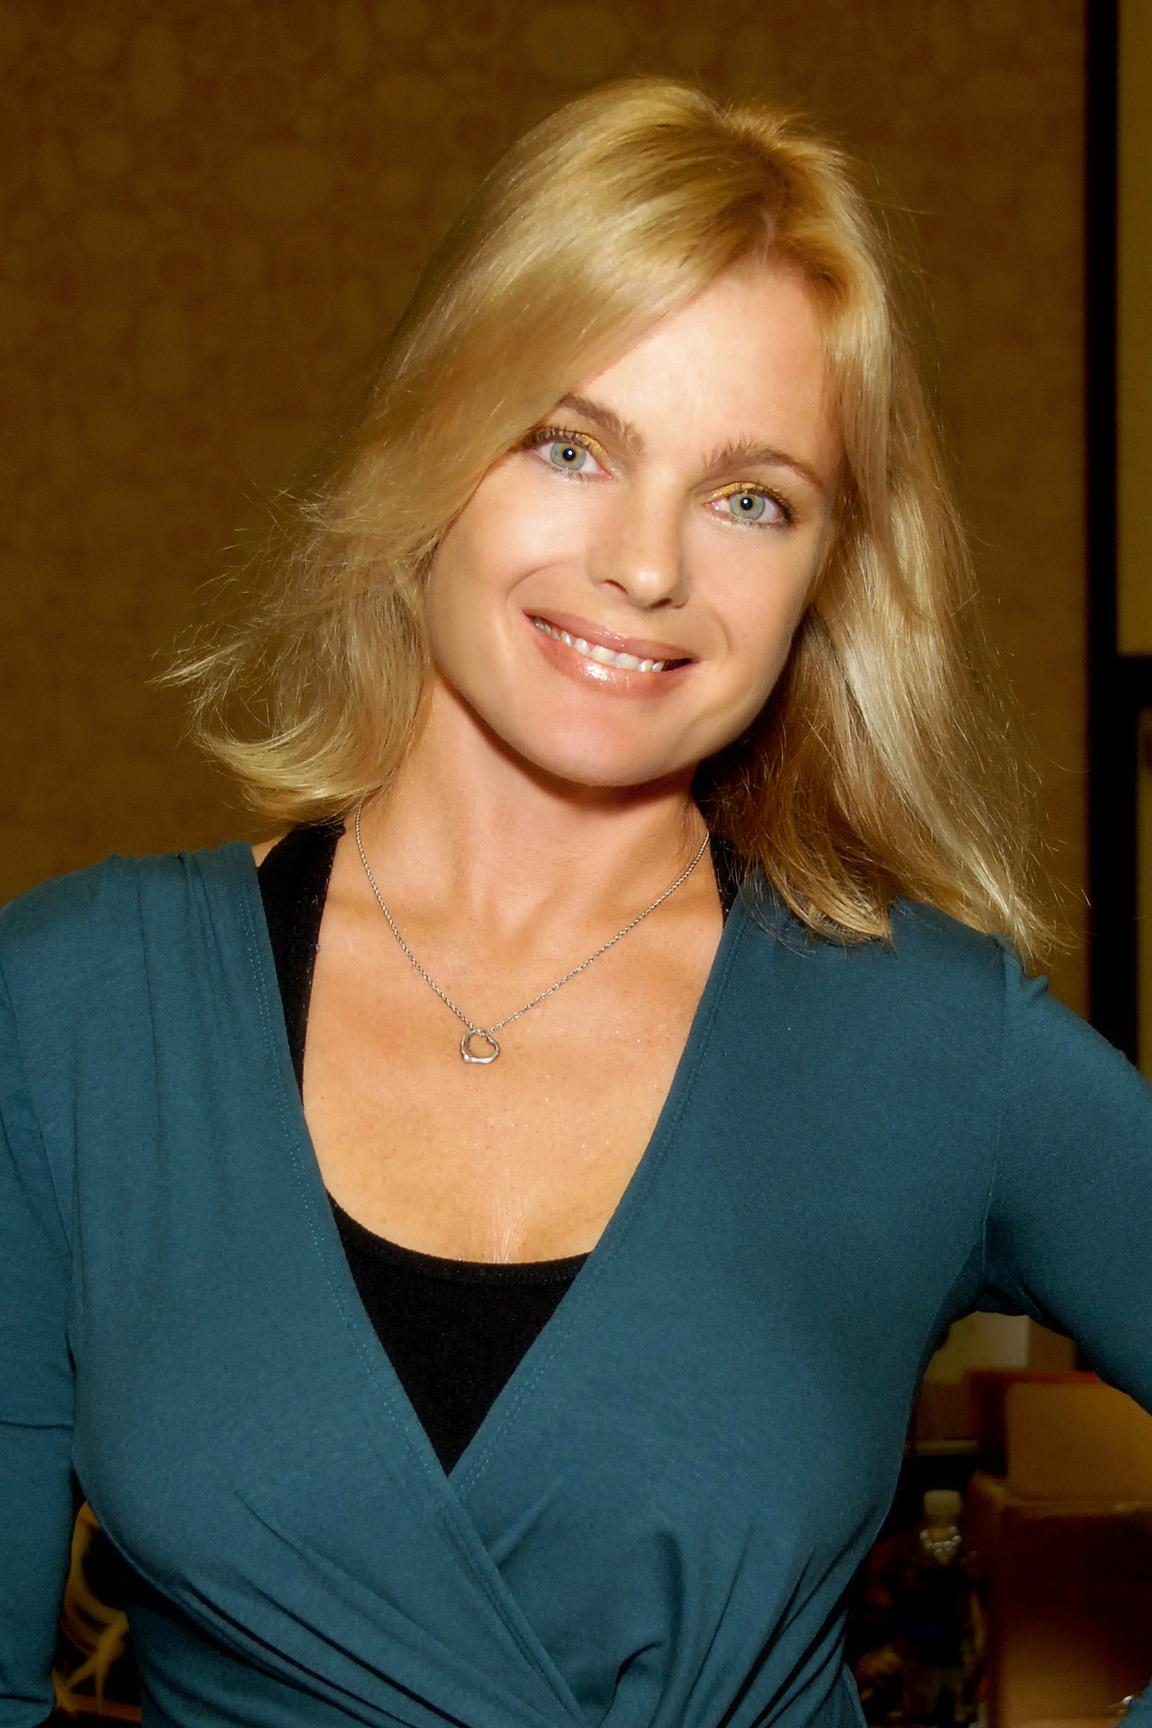 Erika Eleniak Aktfoto